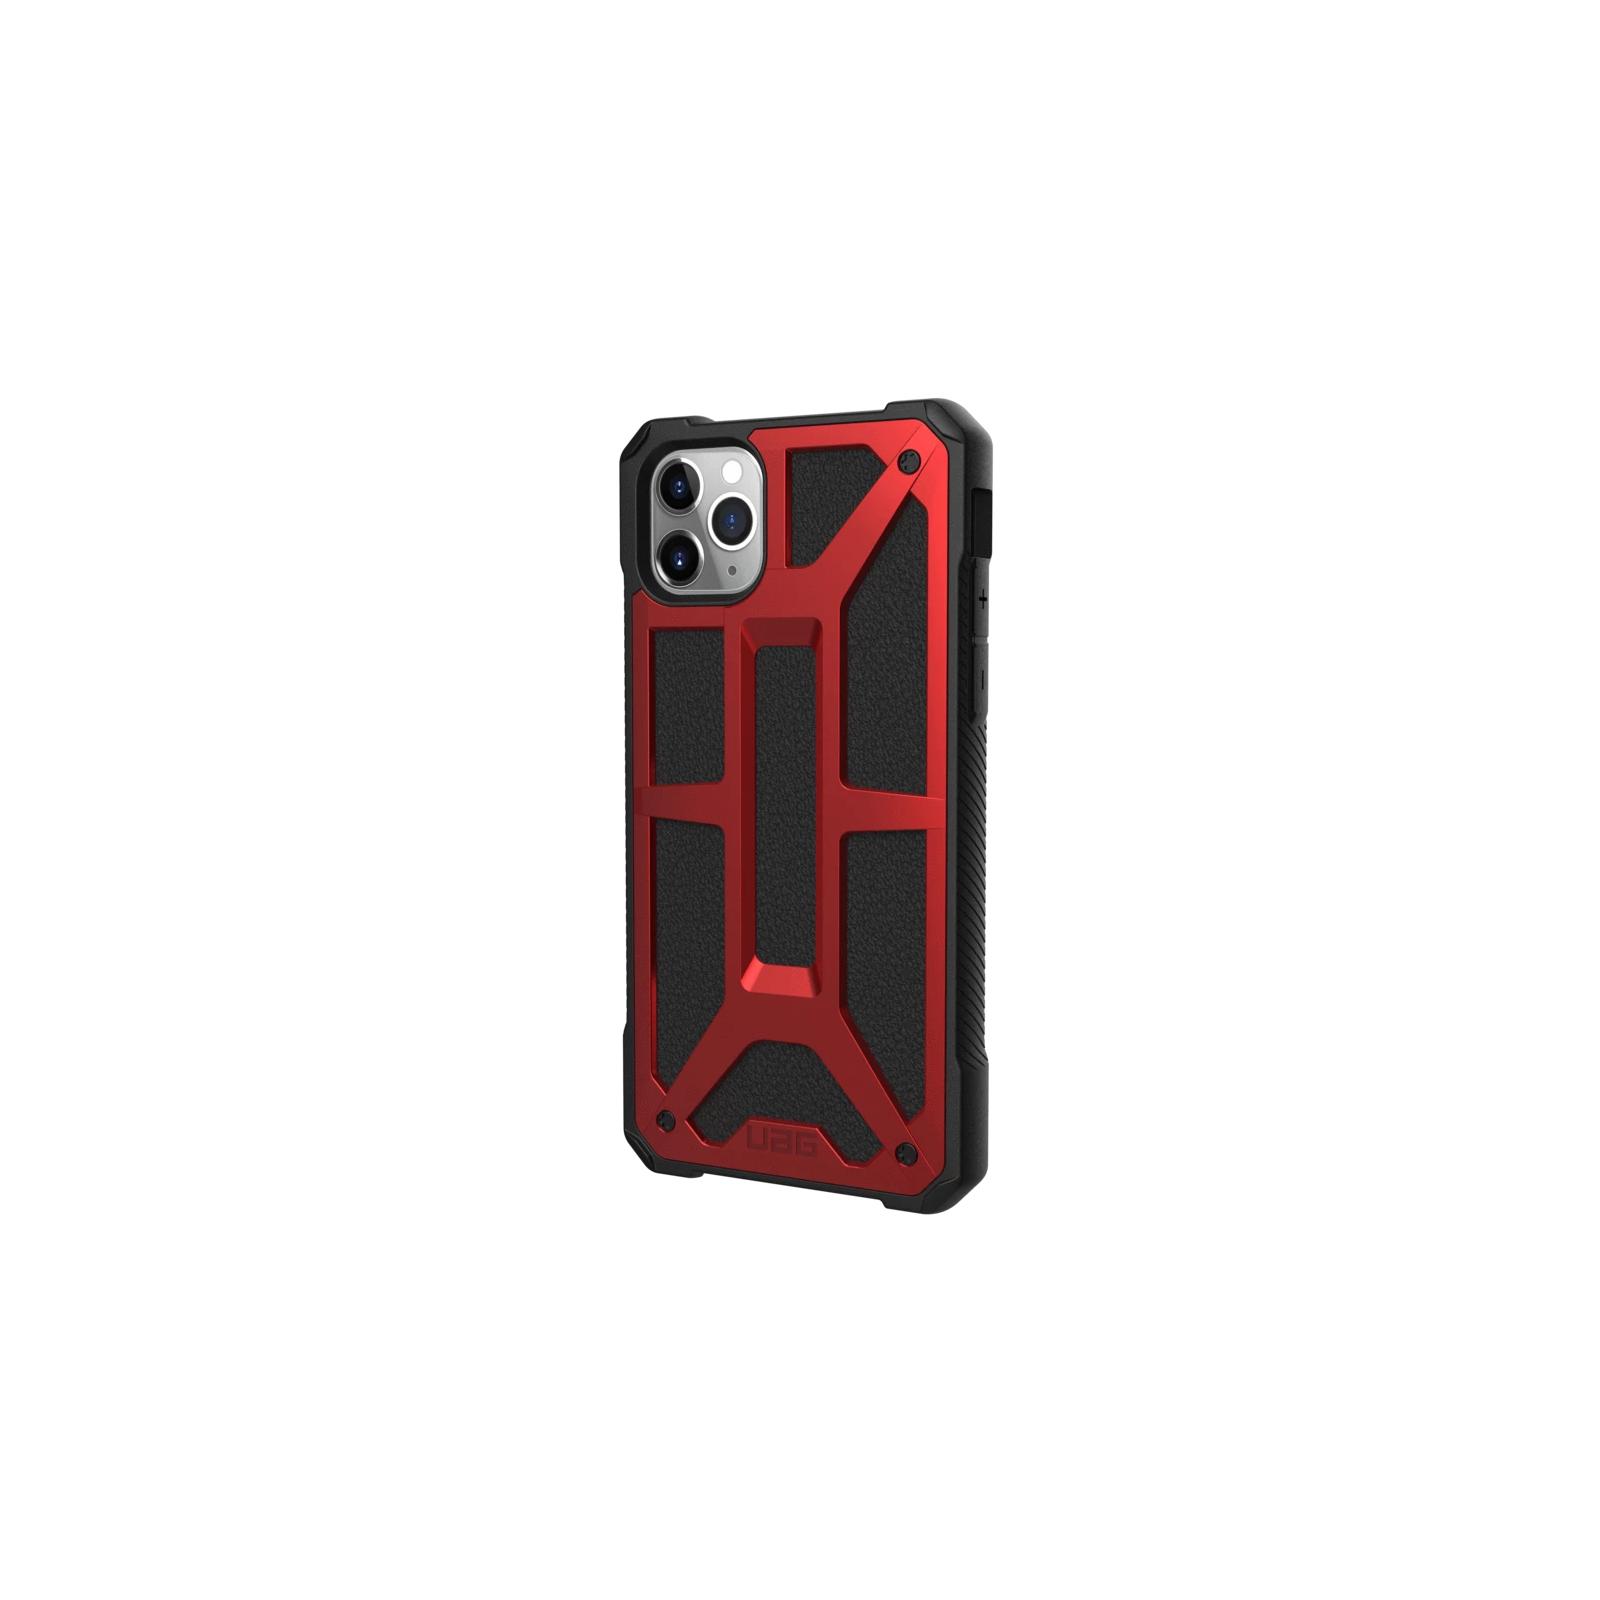 Чехол для моб. телефона Uag iPhone 11 Pro Max Monarch, Black (111721114040) изображение 3